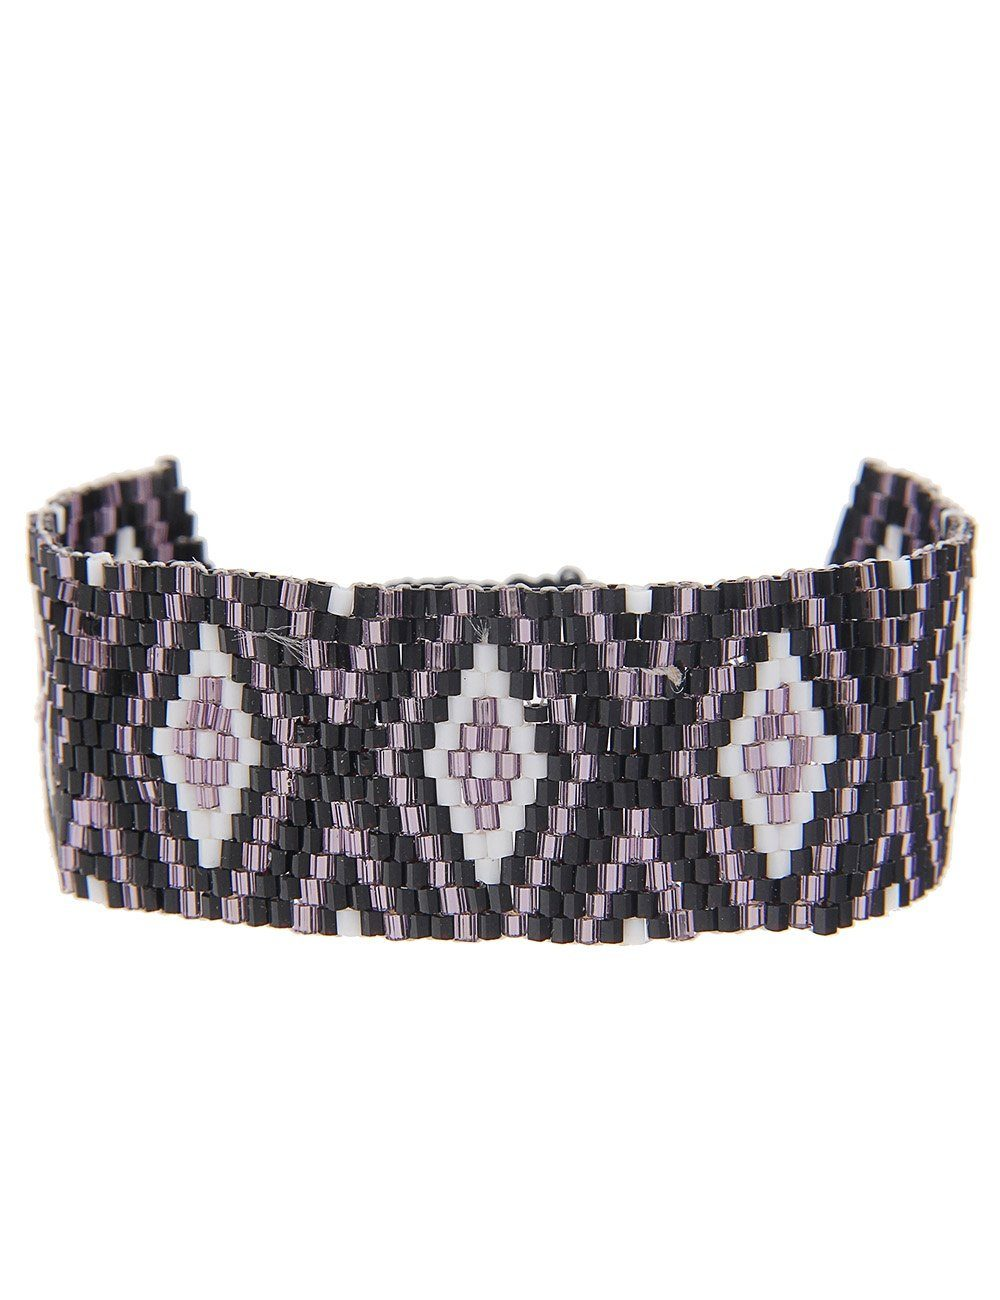 Leslii Armband mit Web-Muster